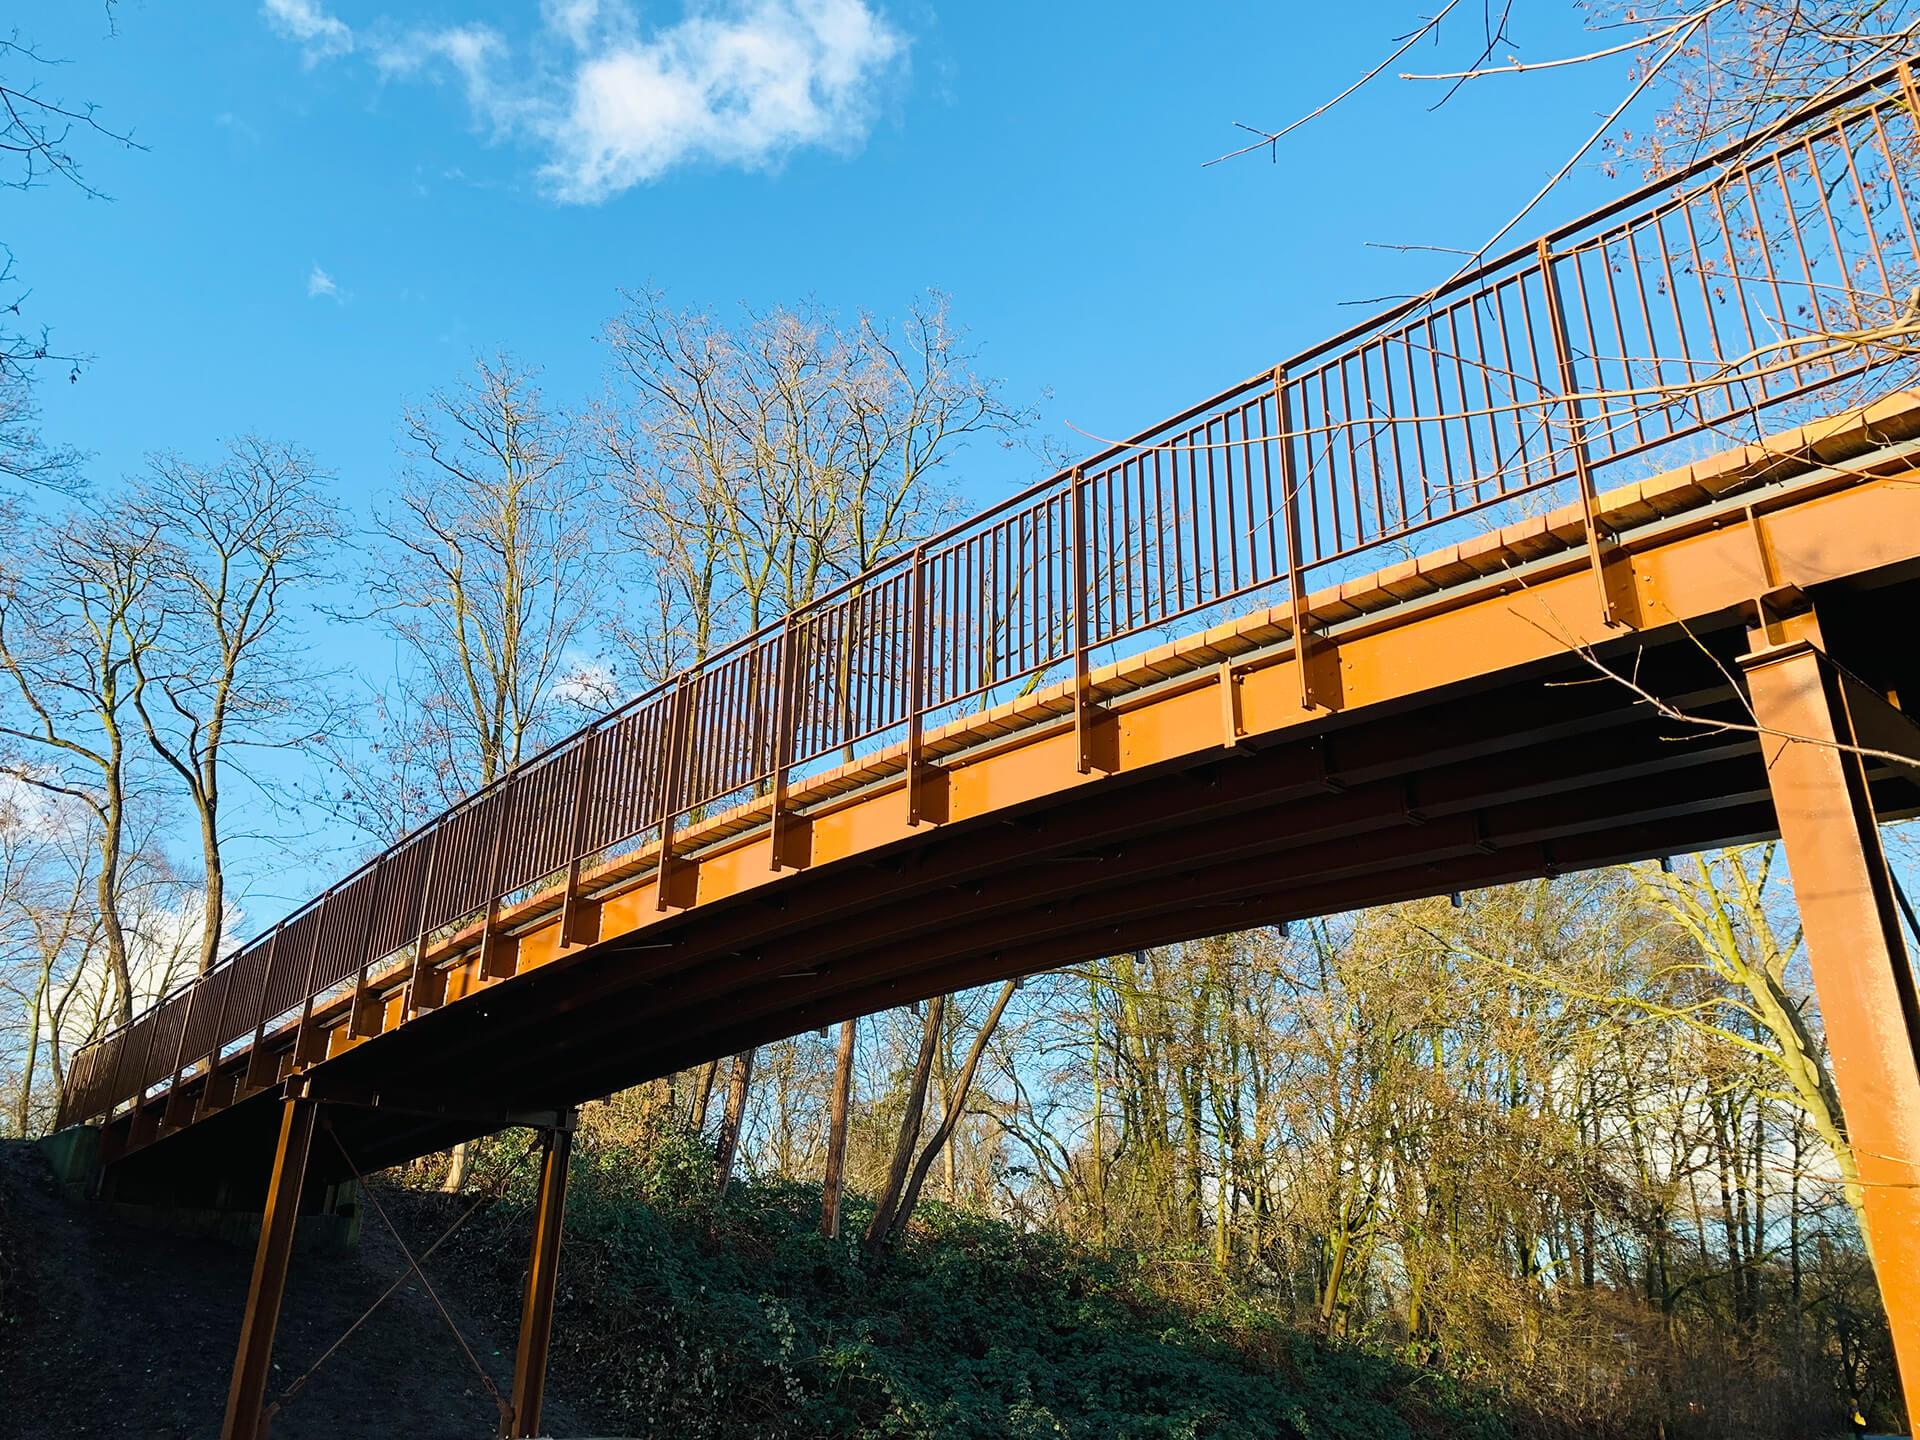 Brücke Mülheim - Stahlbauarbeiten